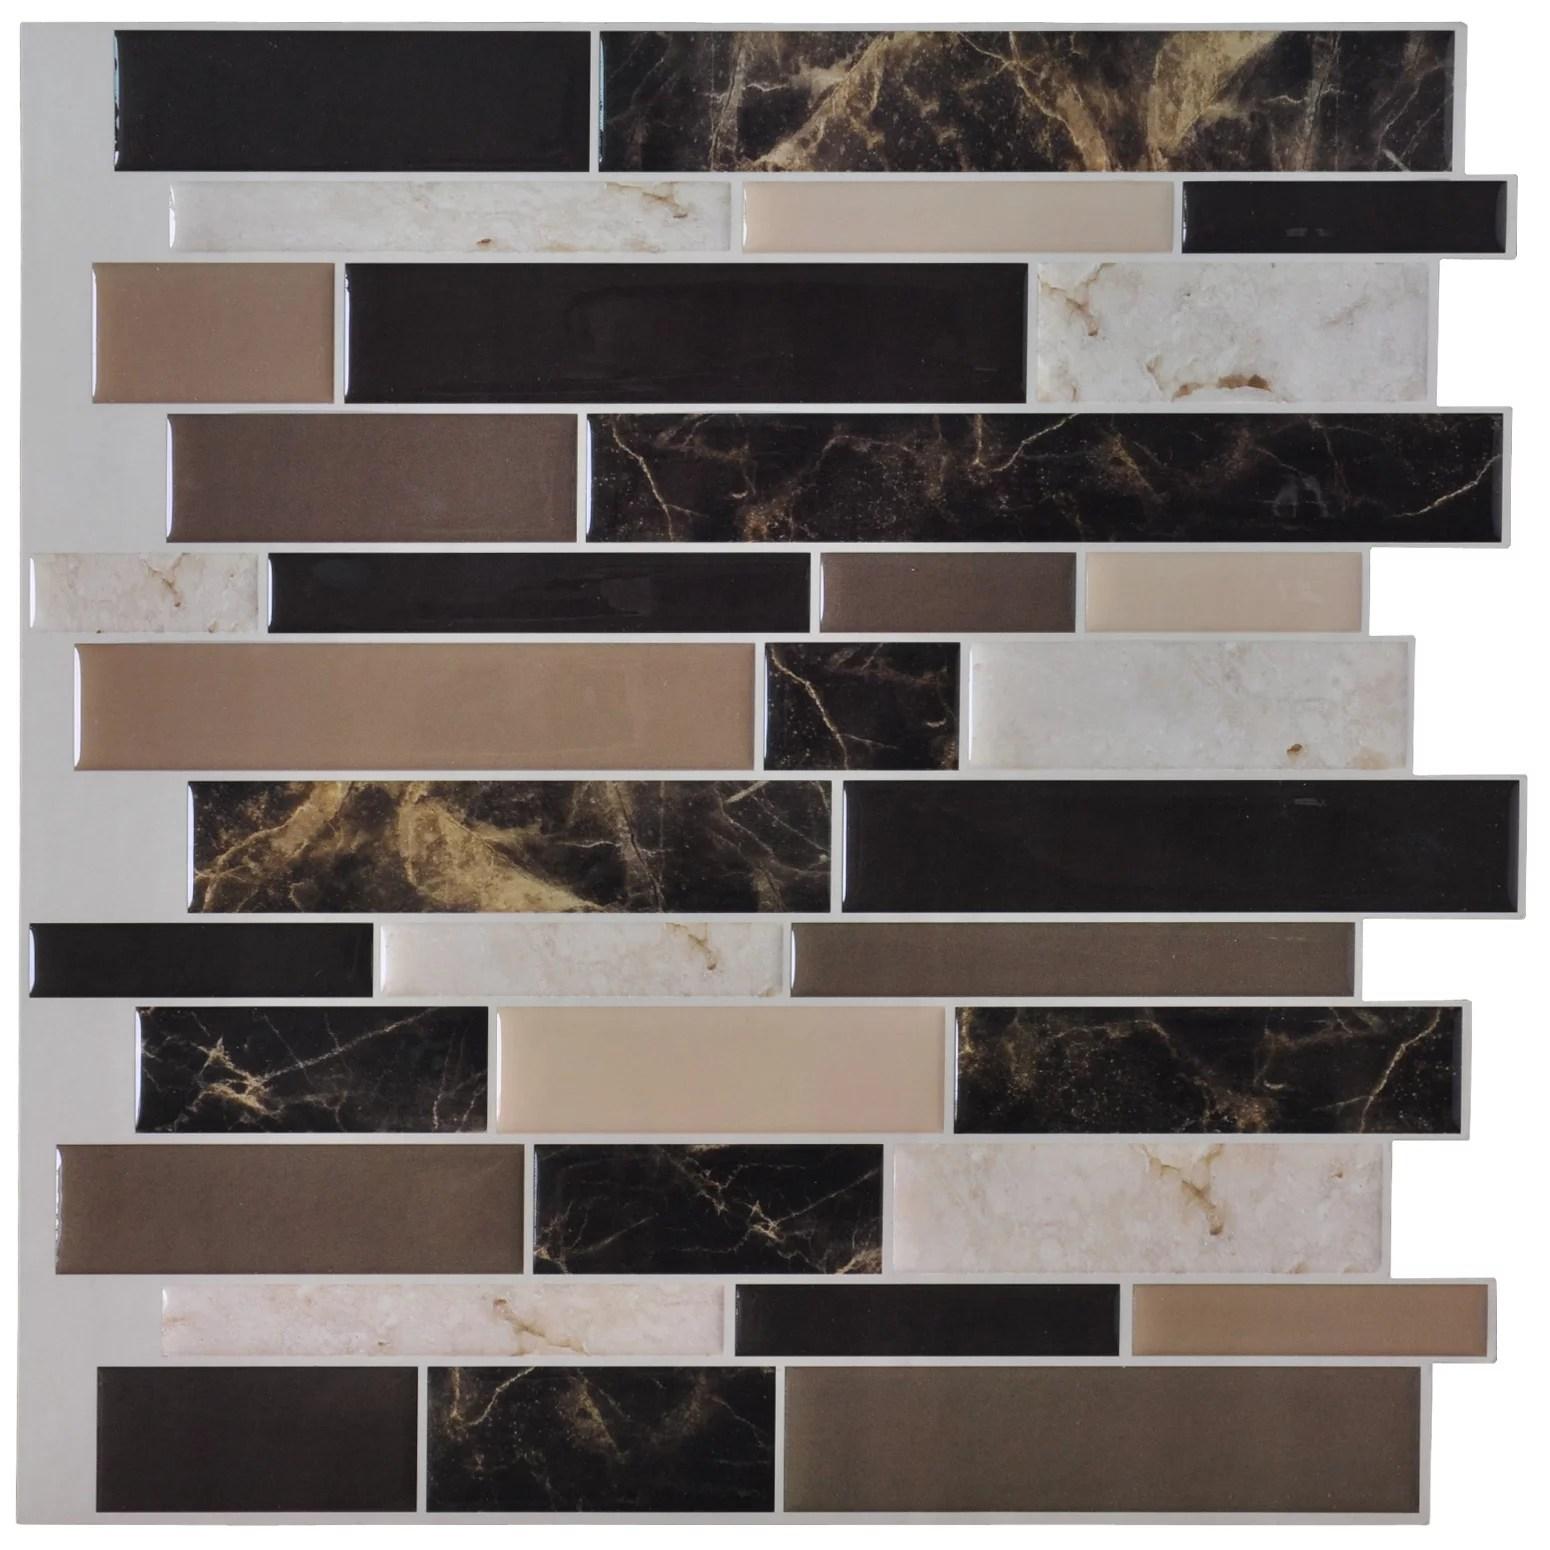 self adhesive wall tile peel and stick backsplash for kitchen 12 x12 6 sheets